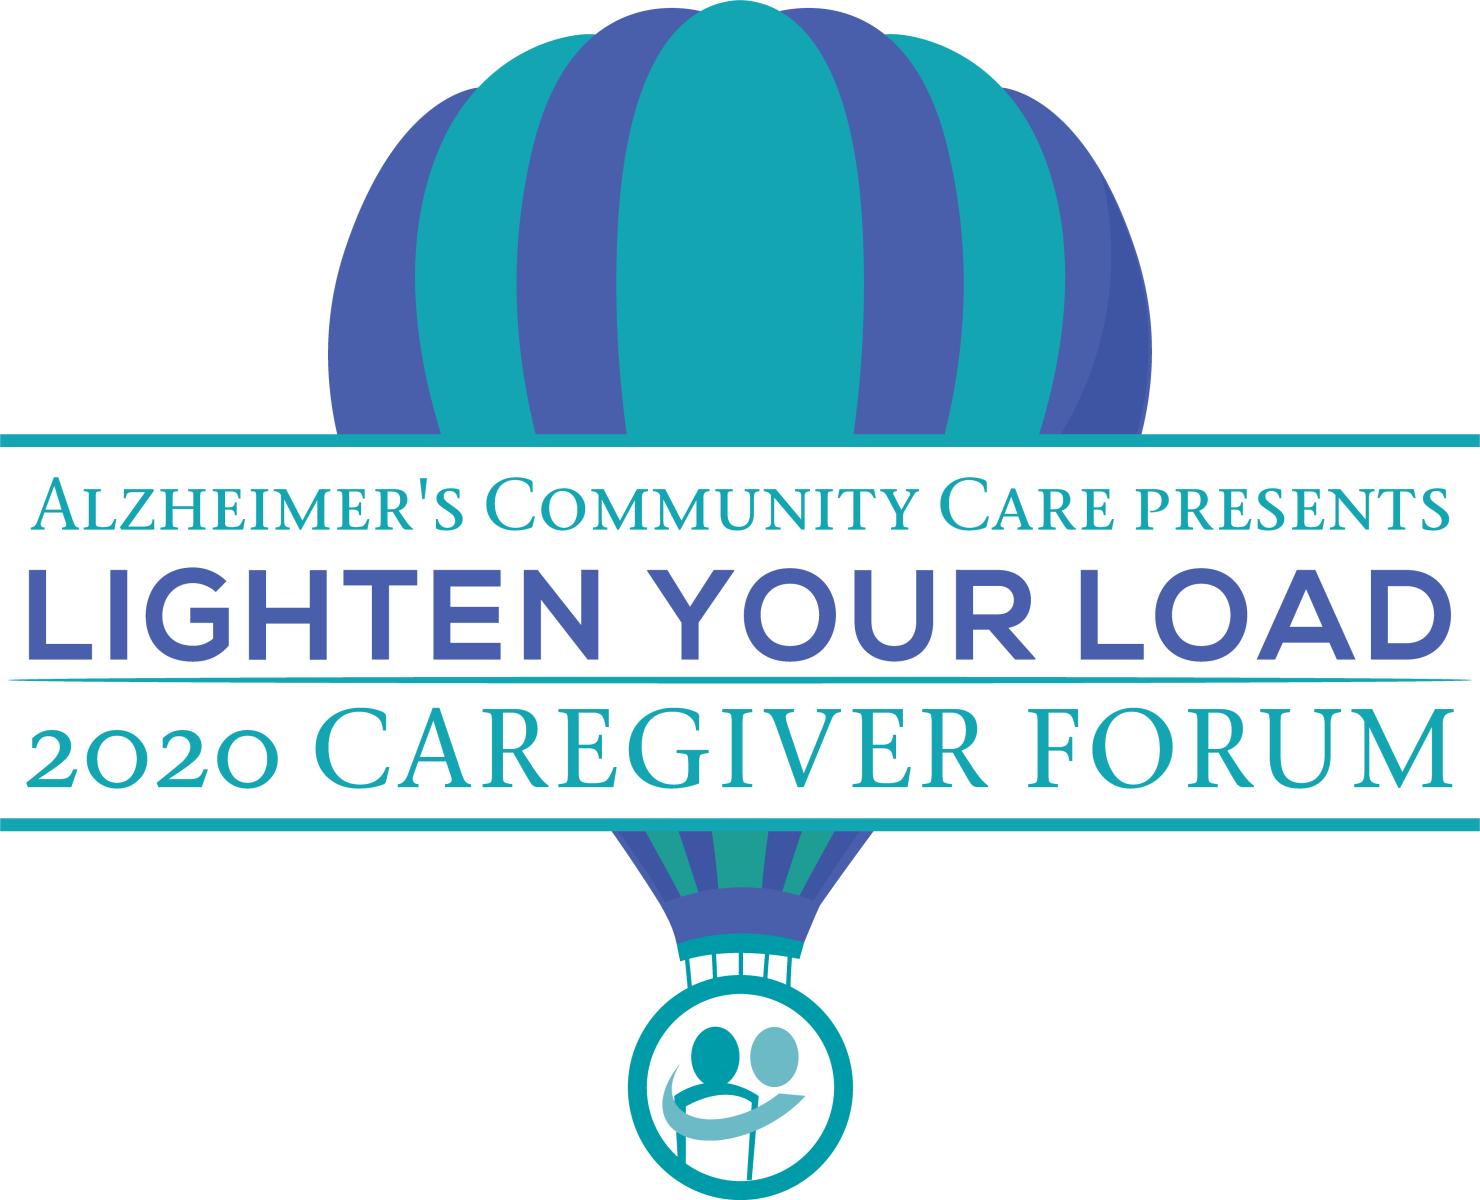 Alzheimer's Community Care presents Lighten Your Load 2019 Caregiver Forum